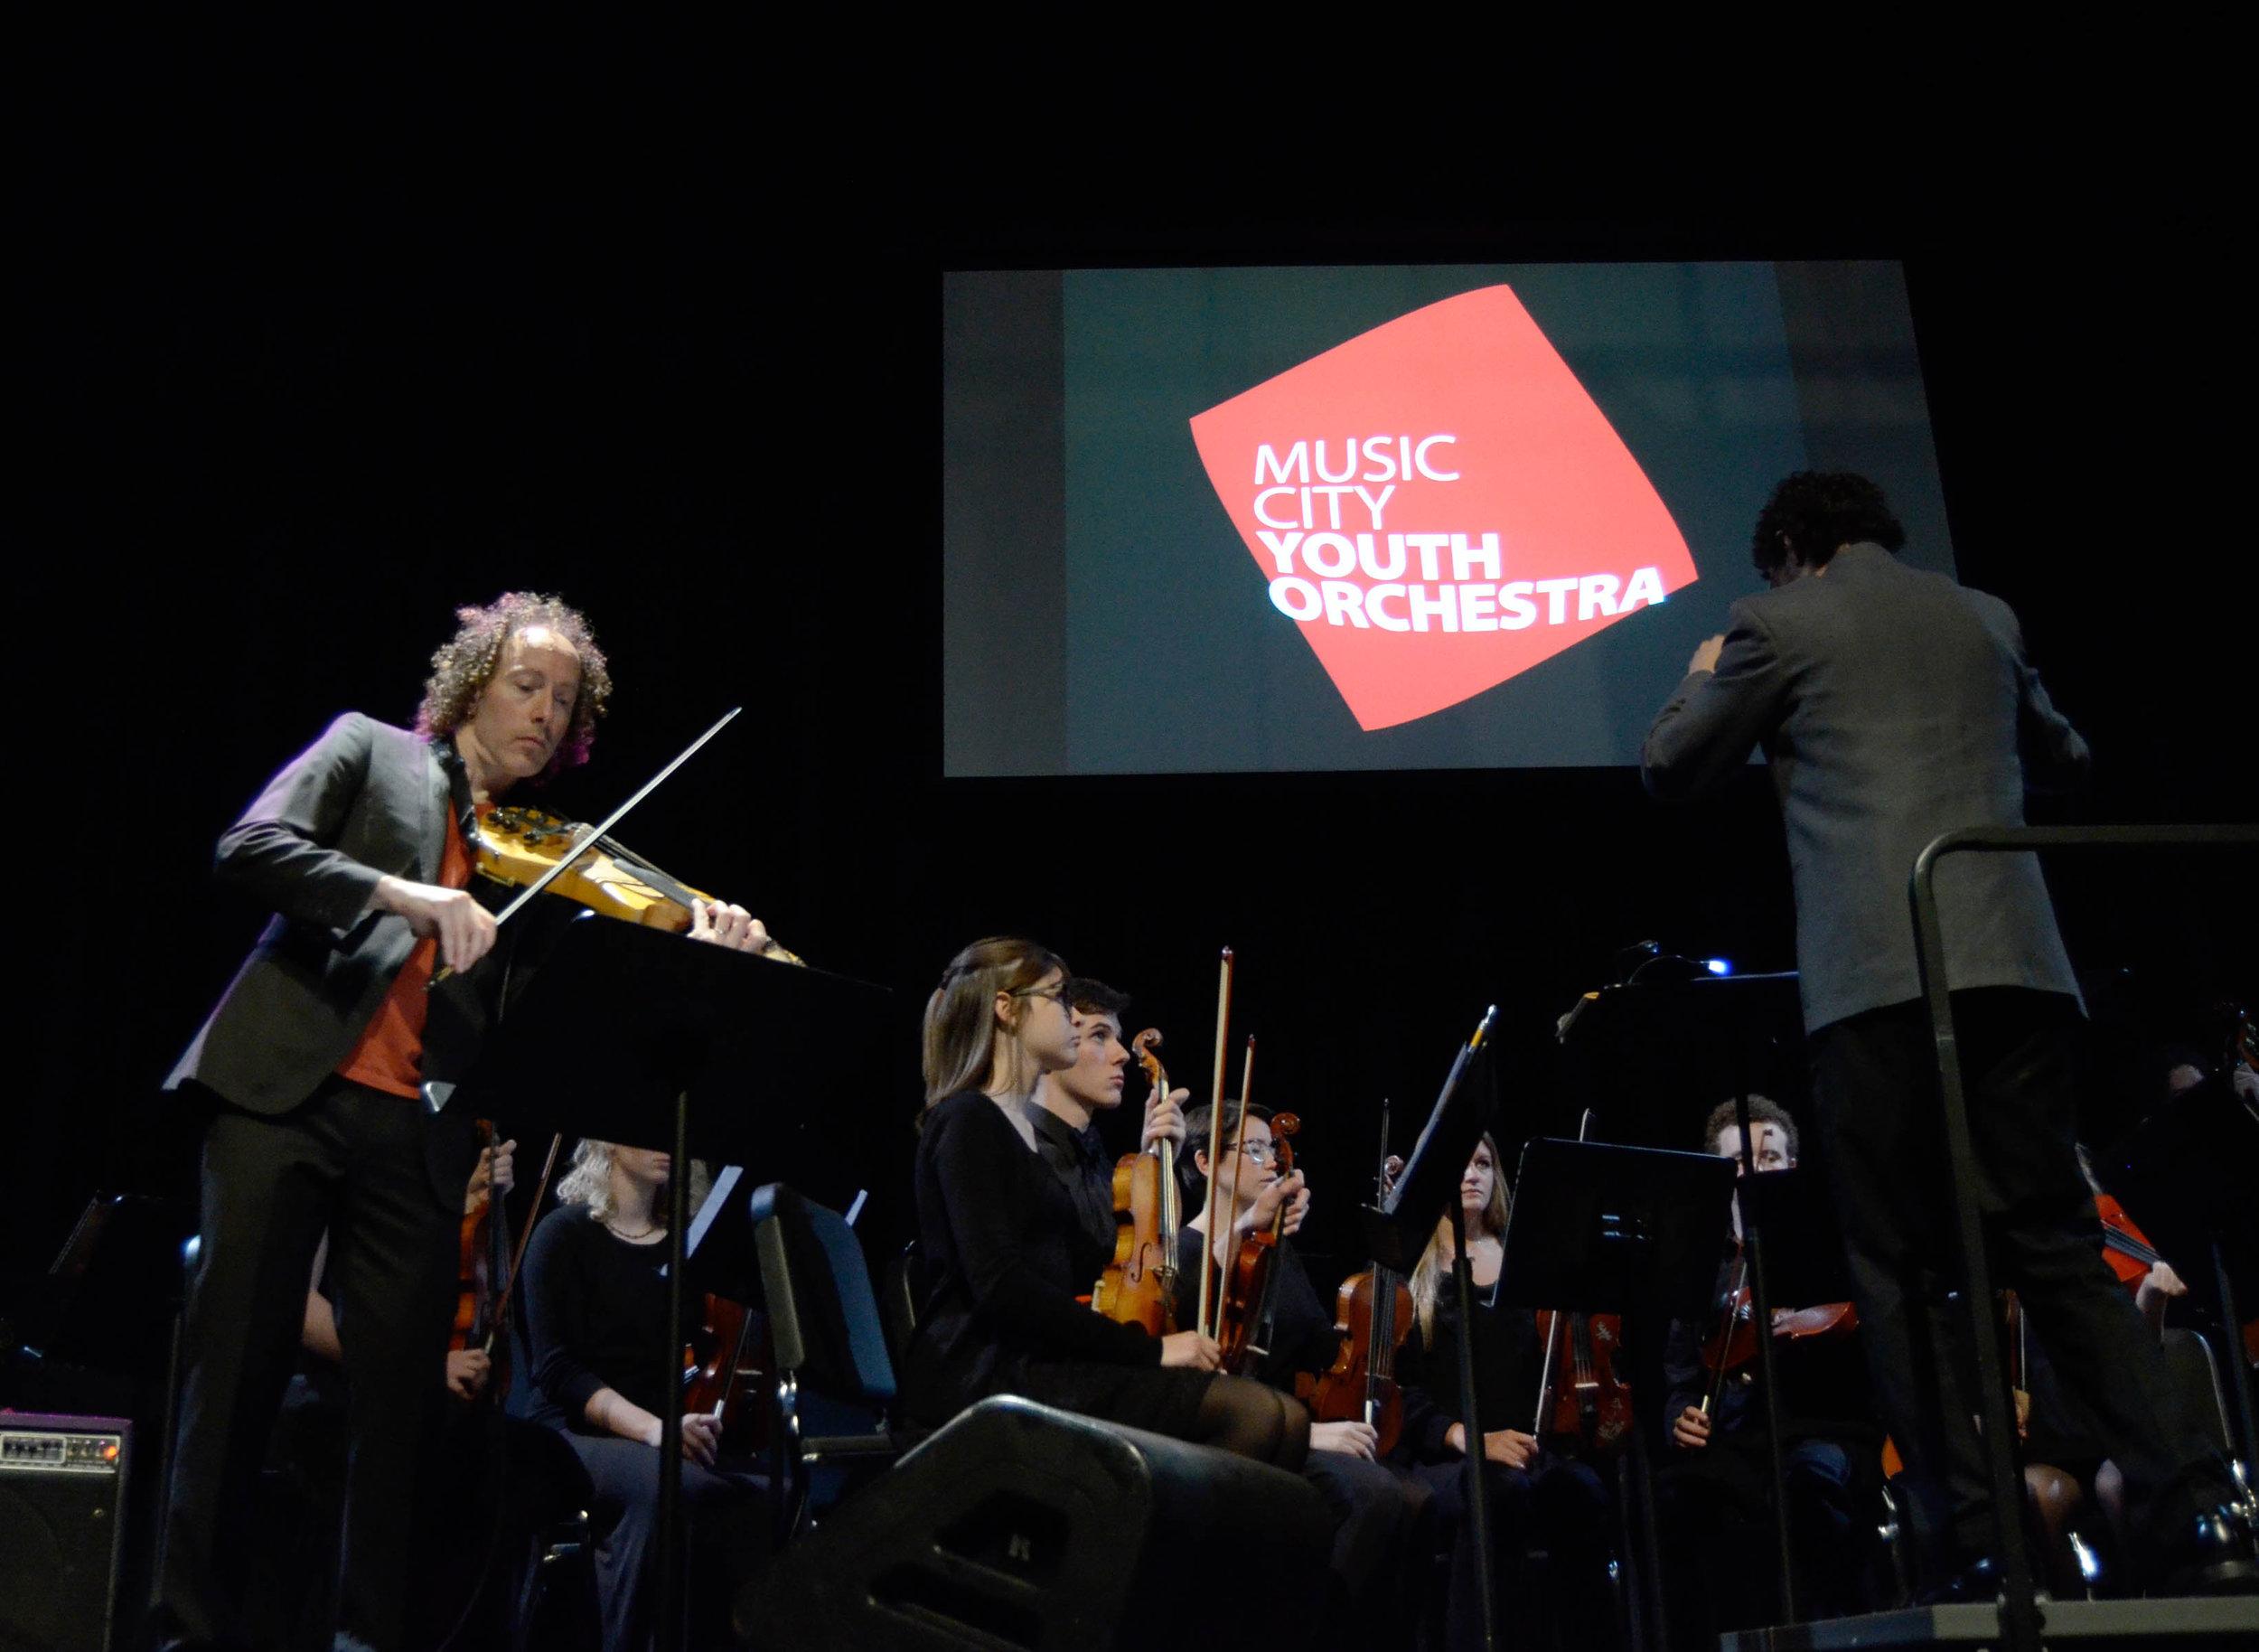 Music City Youth Orchestra 2013-14 8K.jpg